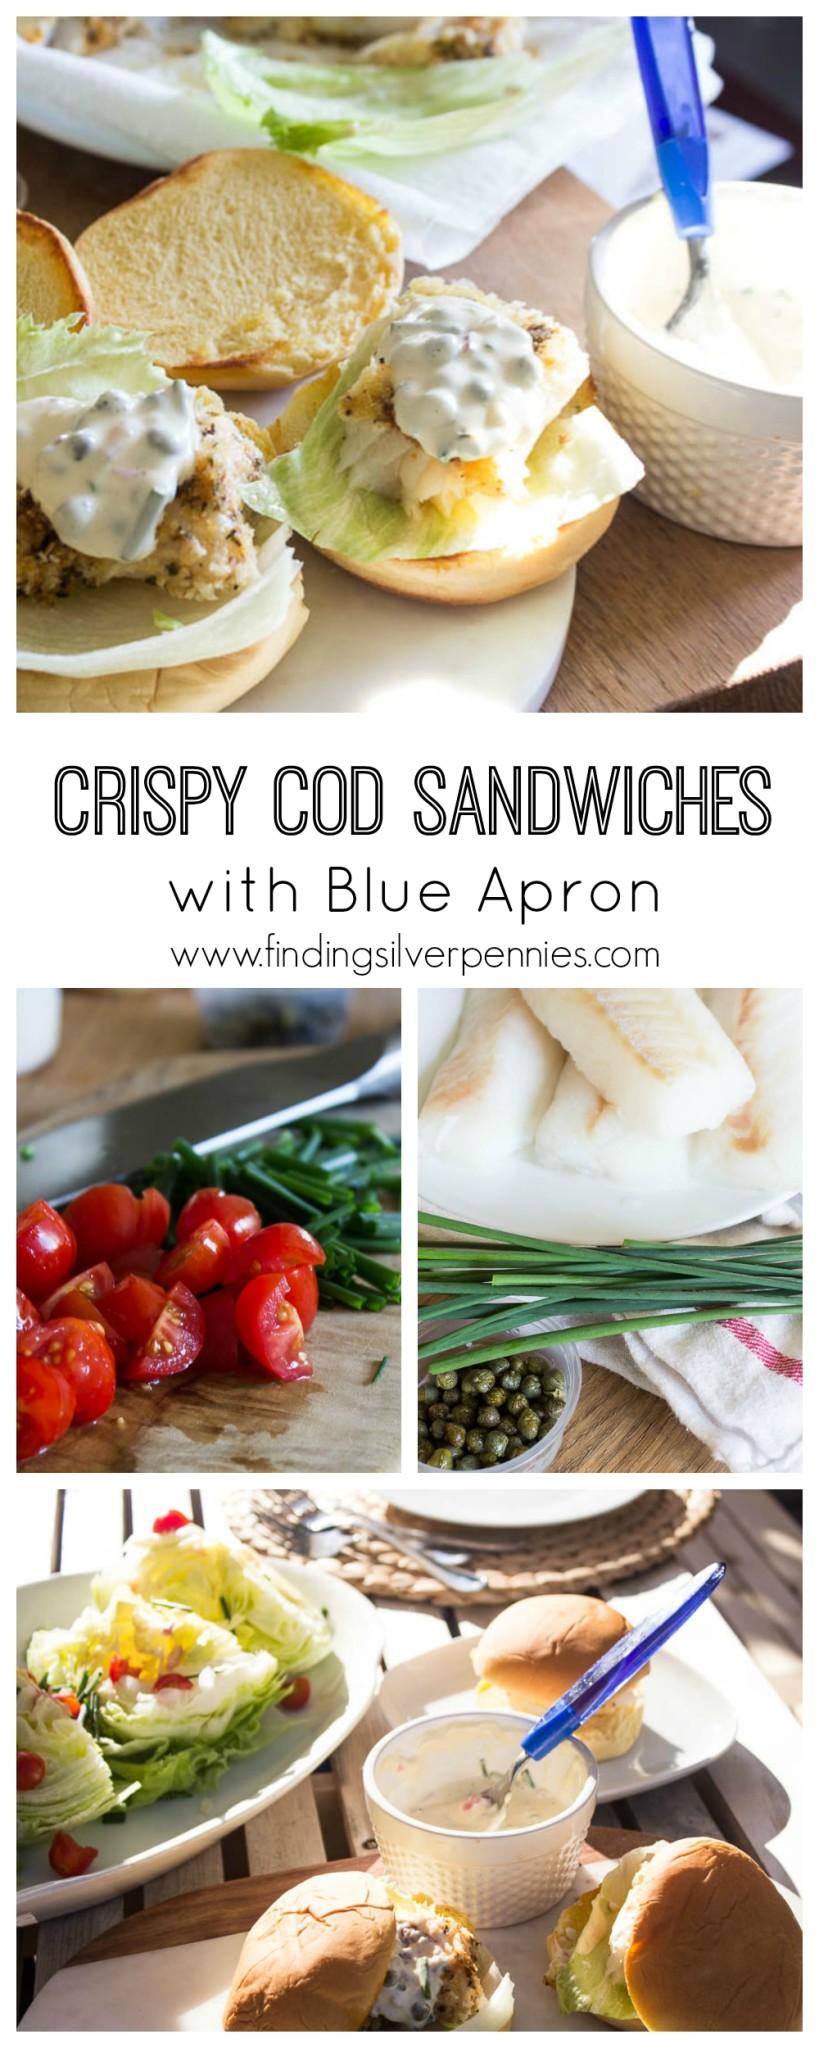 How to Make Crispy Cod Sandwiches